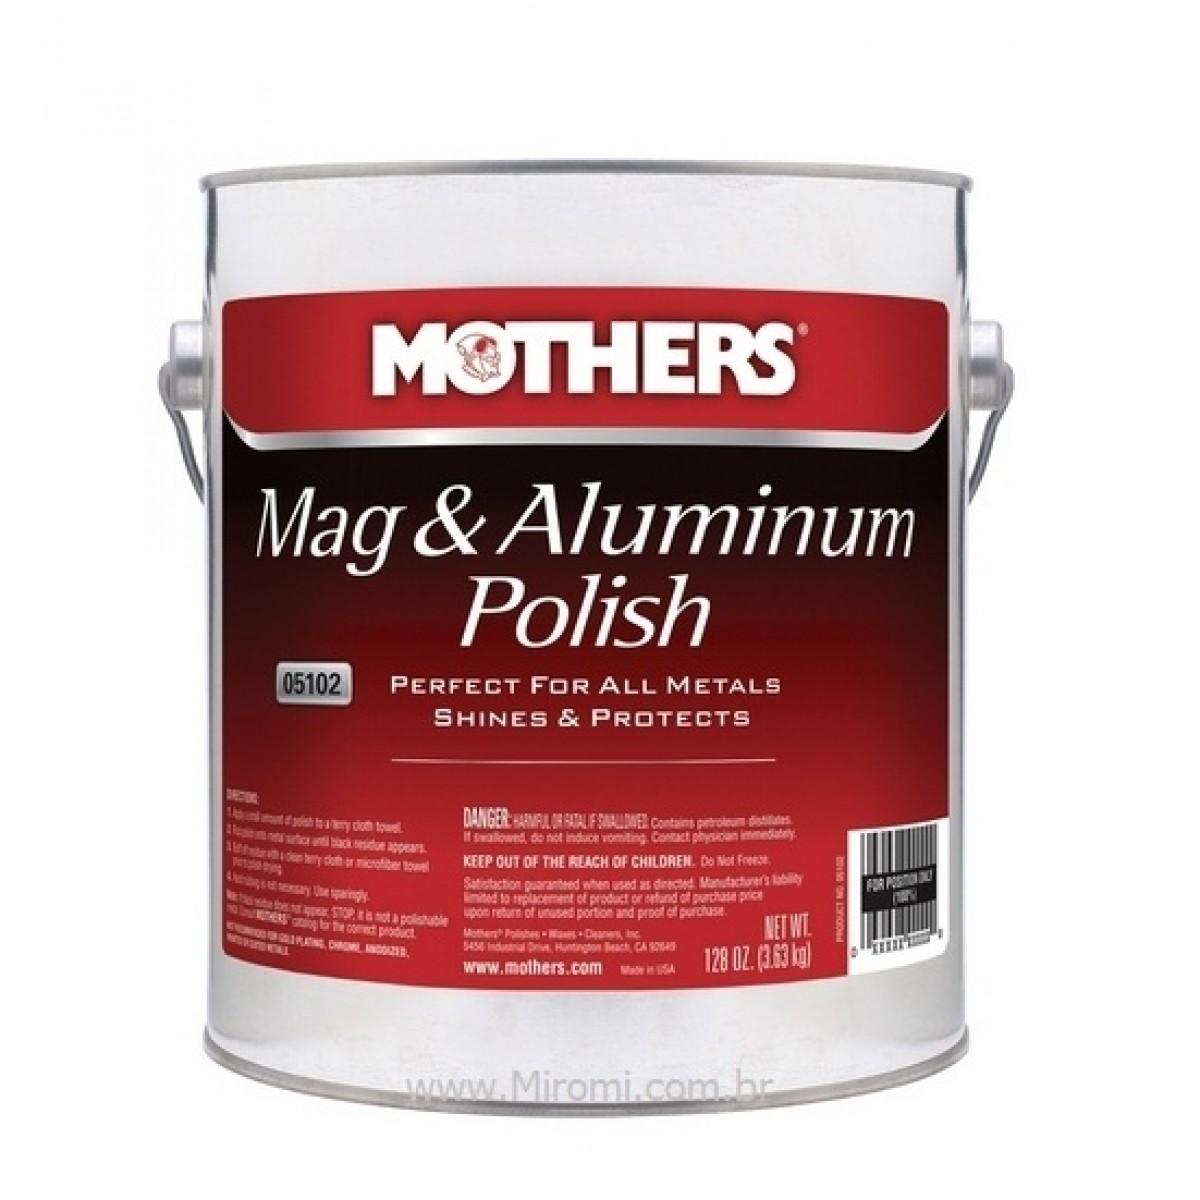 Polidor de Metais e Alumínios Mag & Aluminum Polish 3,6kg Mothers